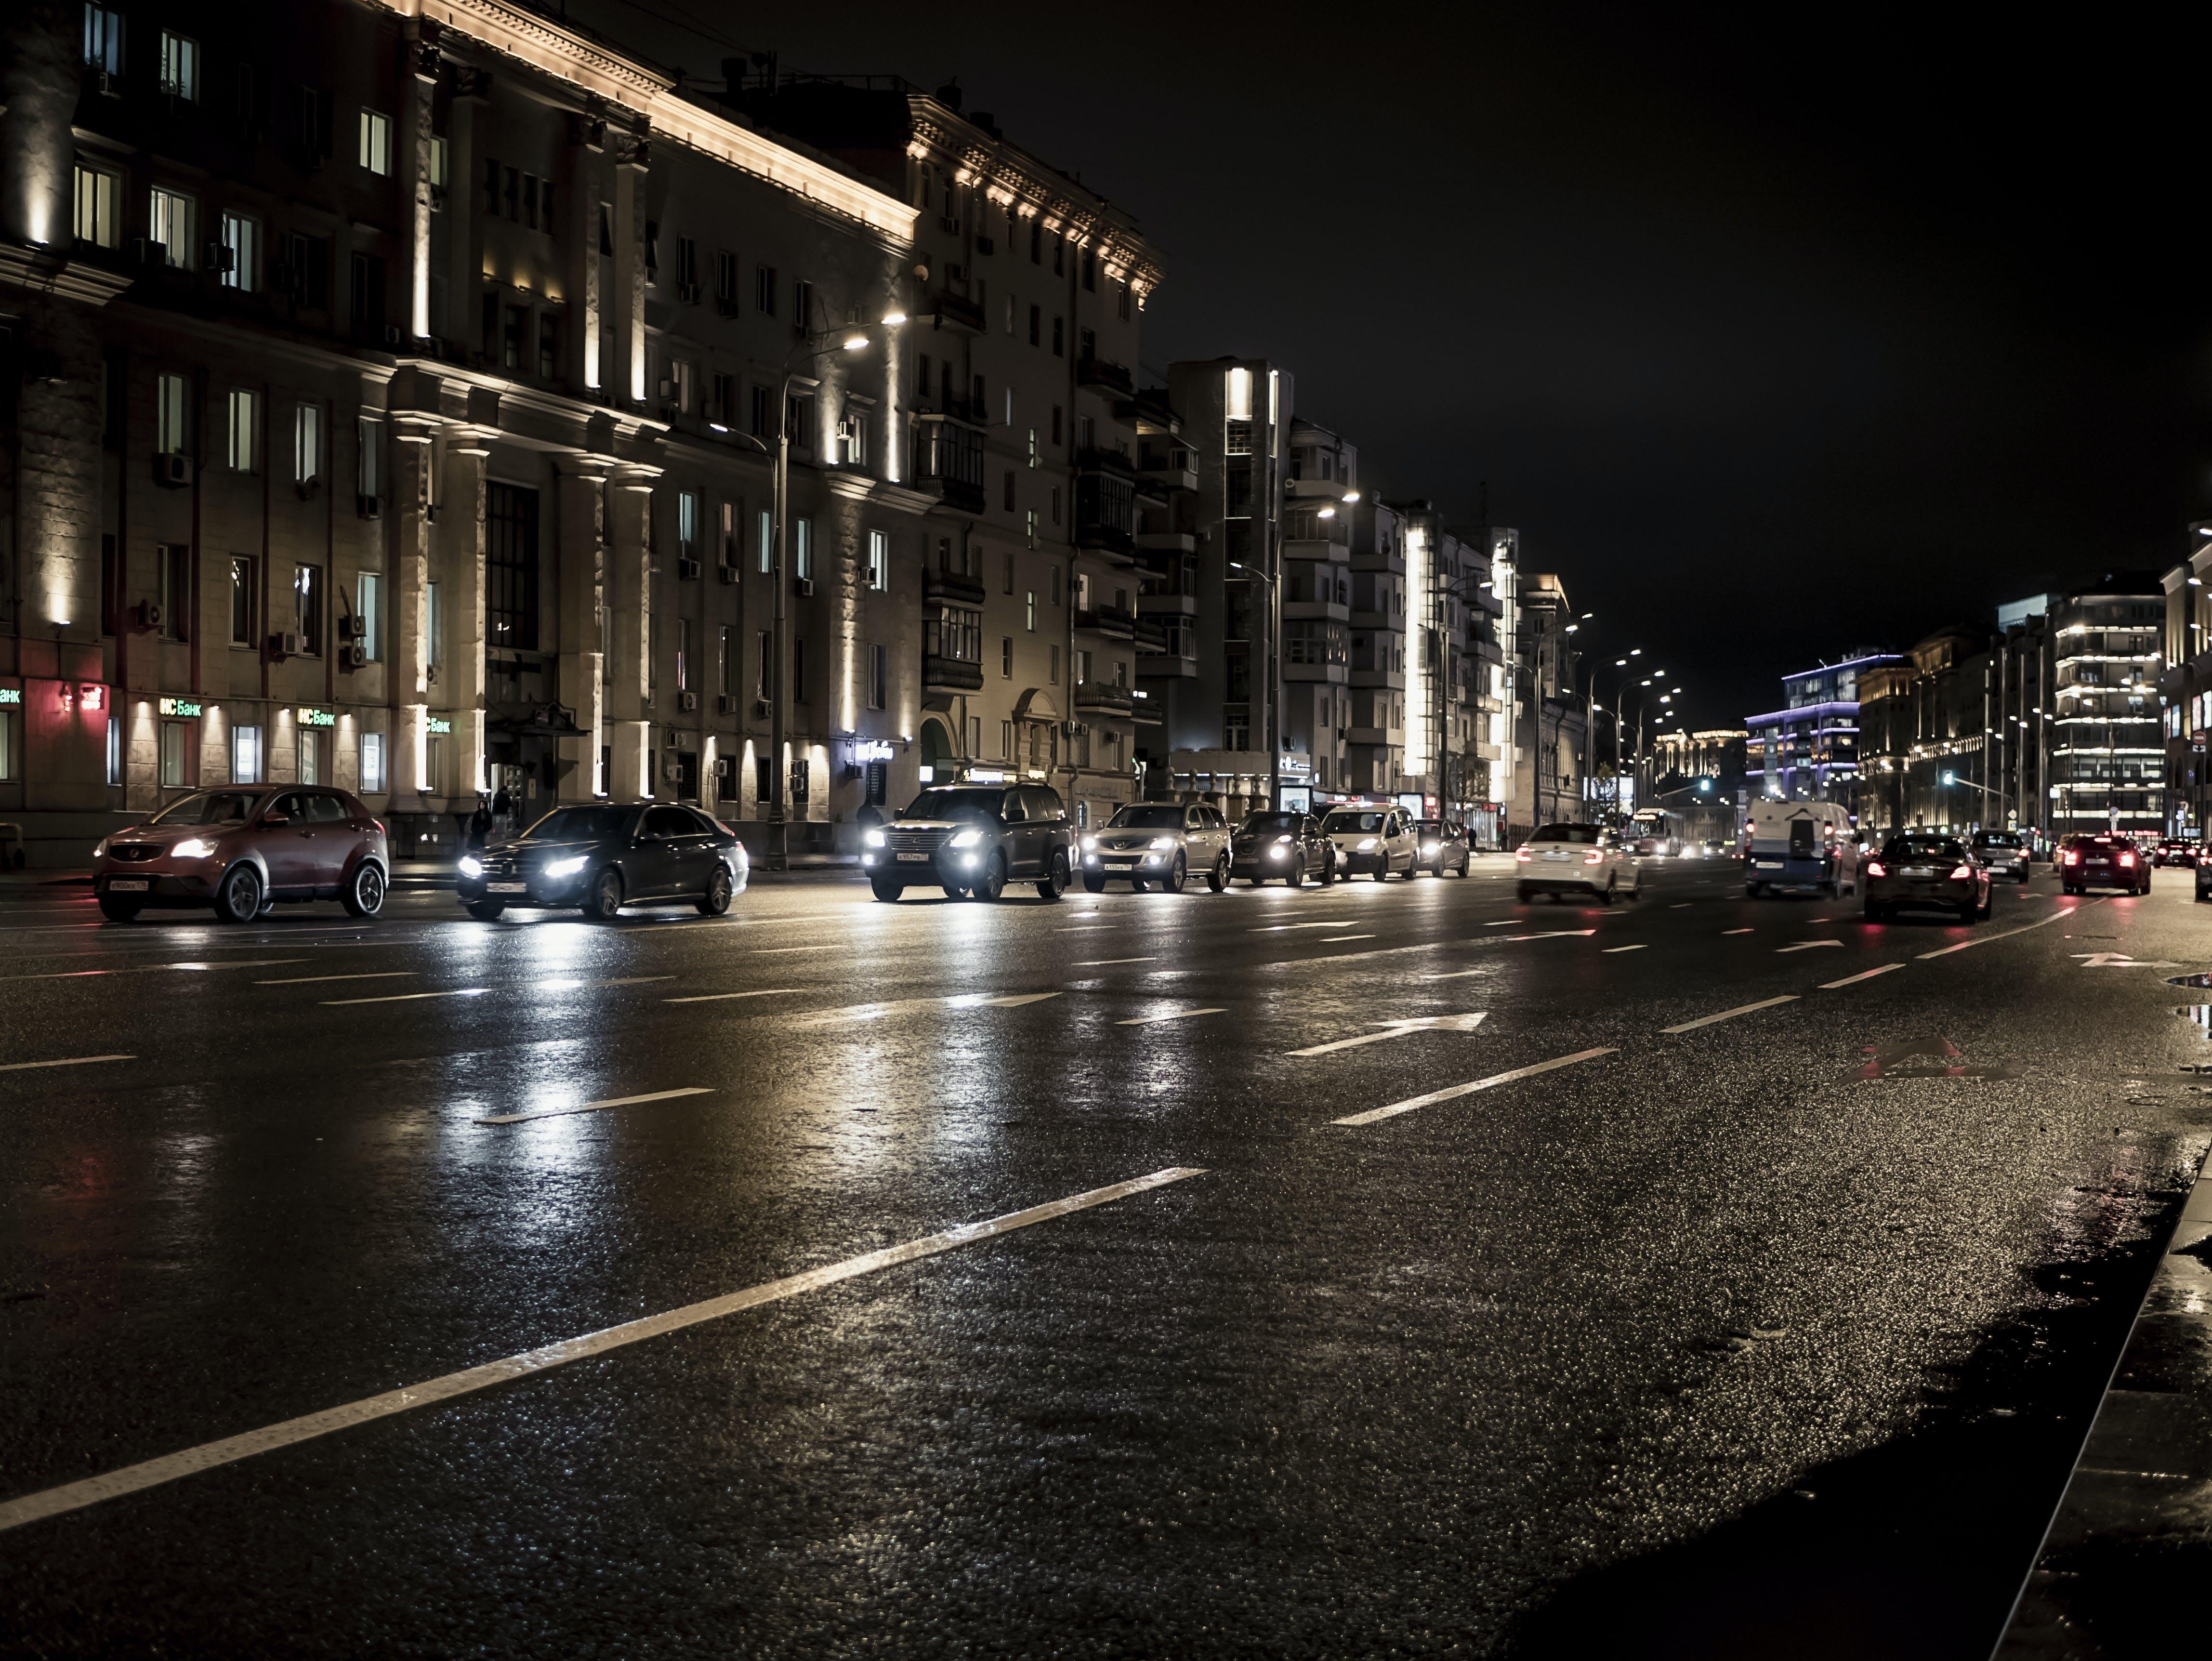 Free stock photo of light, city, cars, traffic